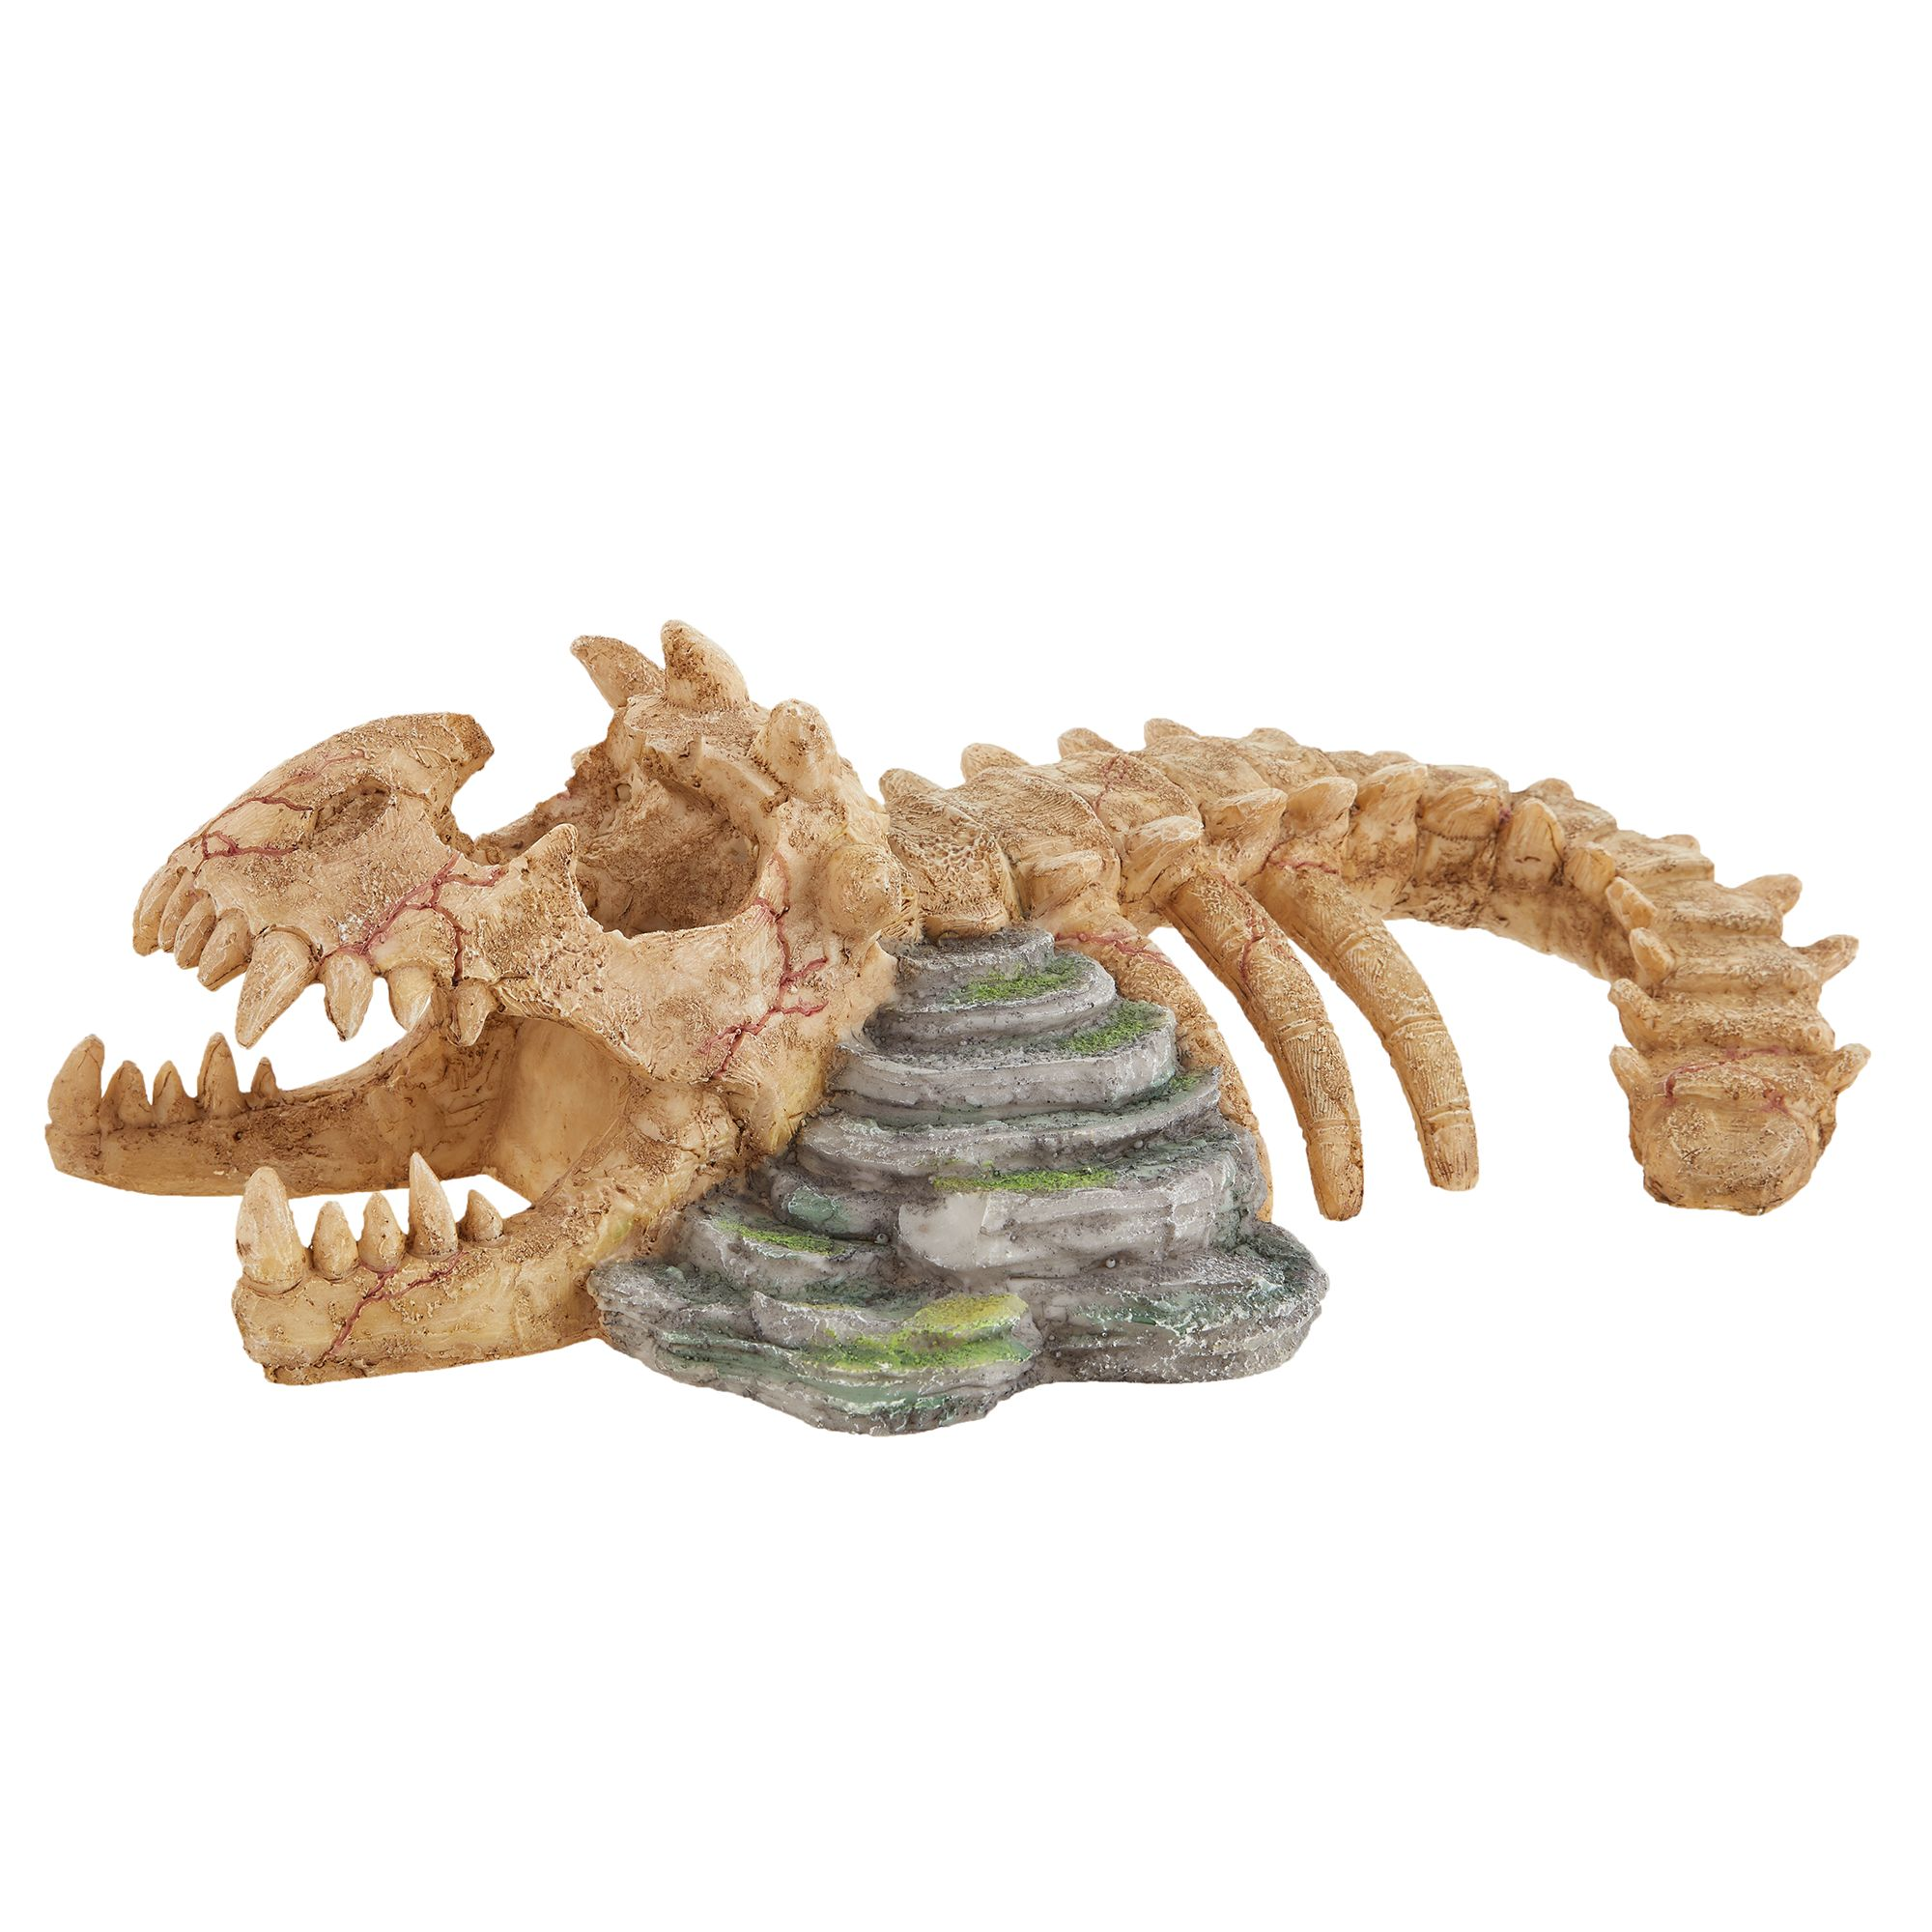 Thrive Dinosaur Skeleton Reptile Decor Reptile Habitat Decor Petsmart